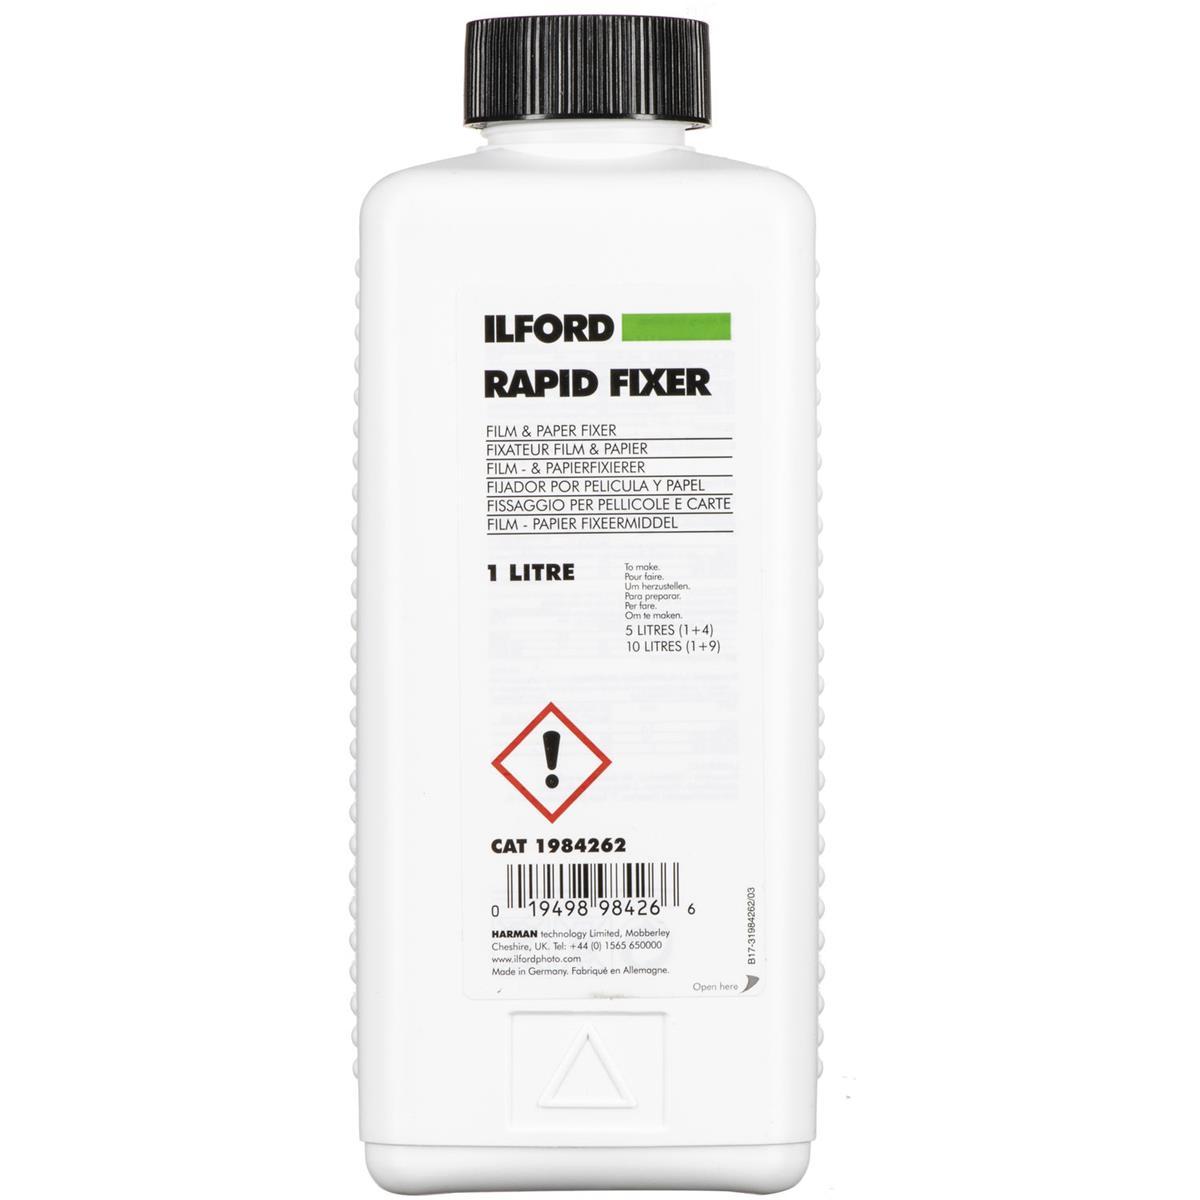 Ilford 1984262 Rapid Fixer Liquid1 Liter